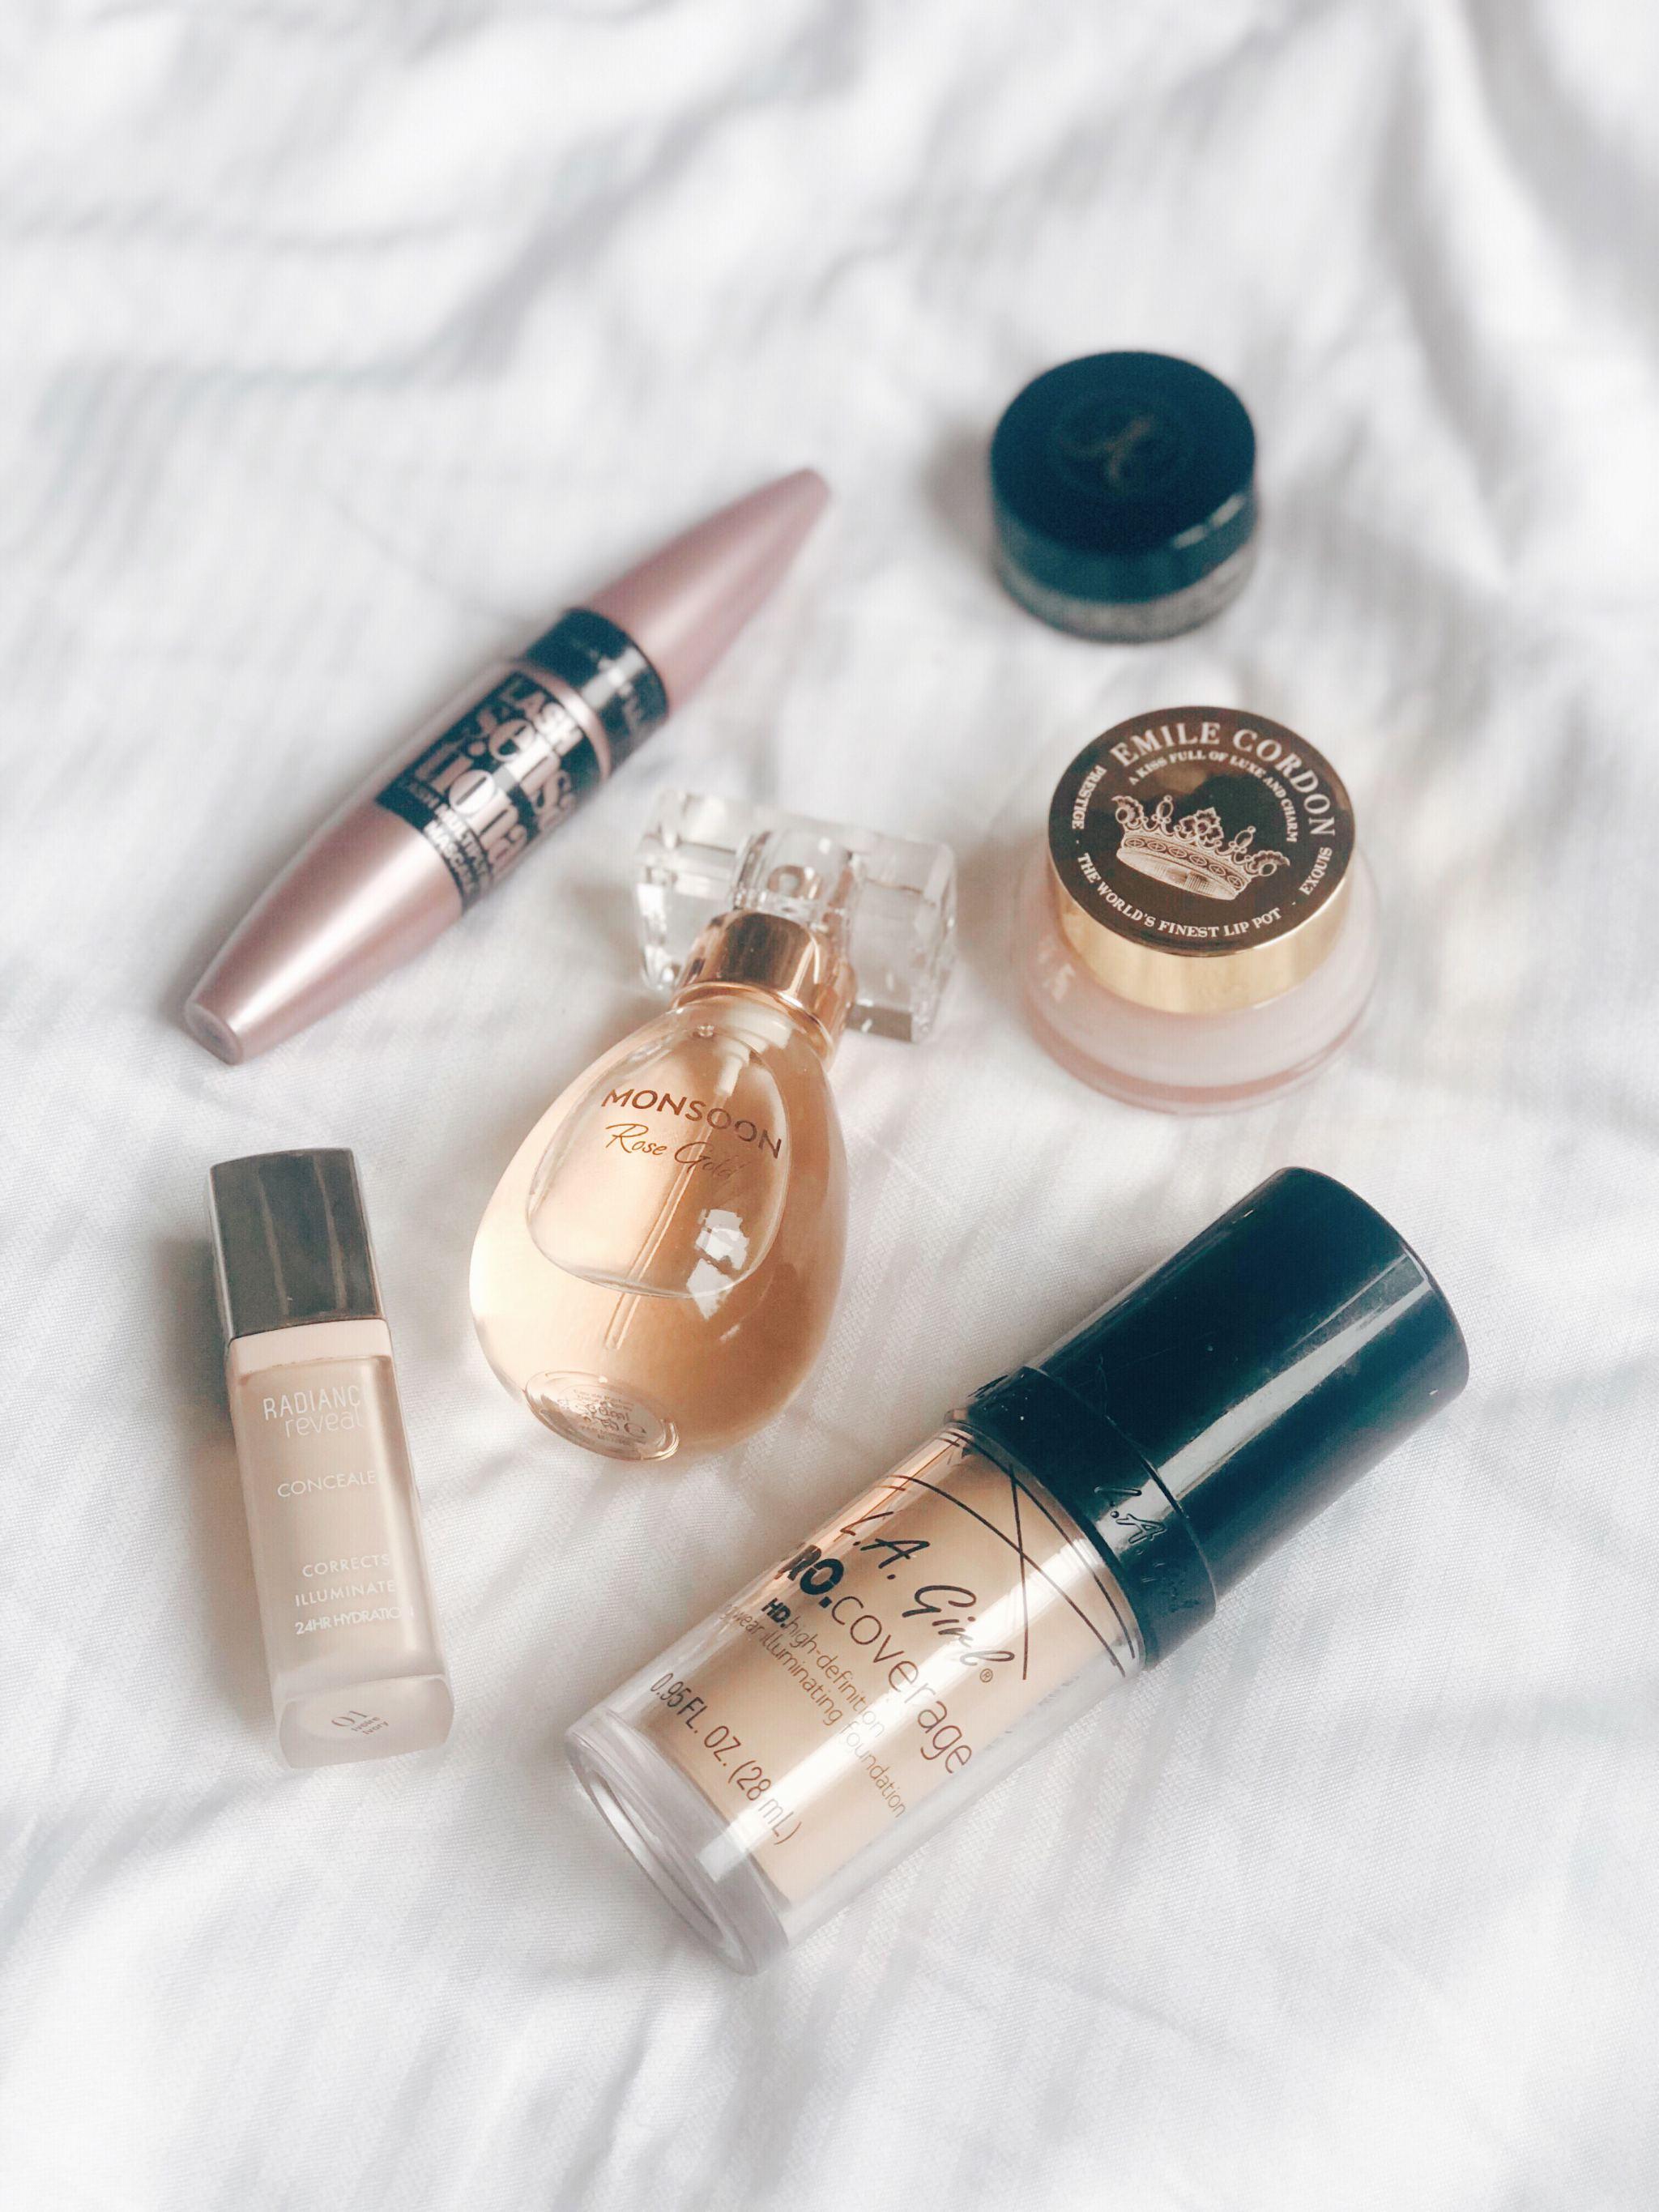 Shop your stash makeup